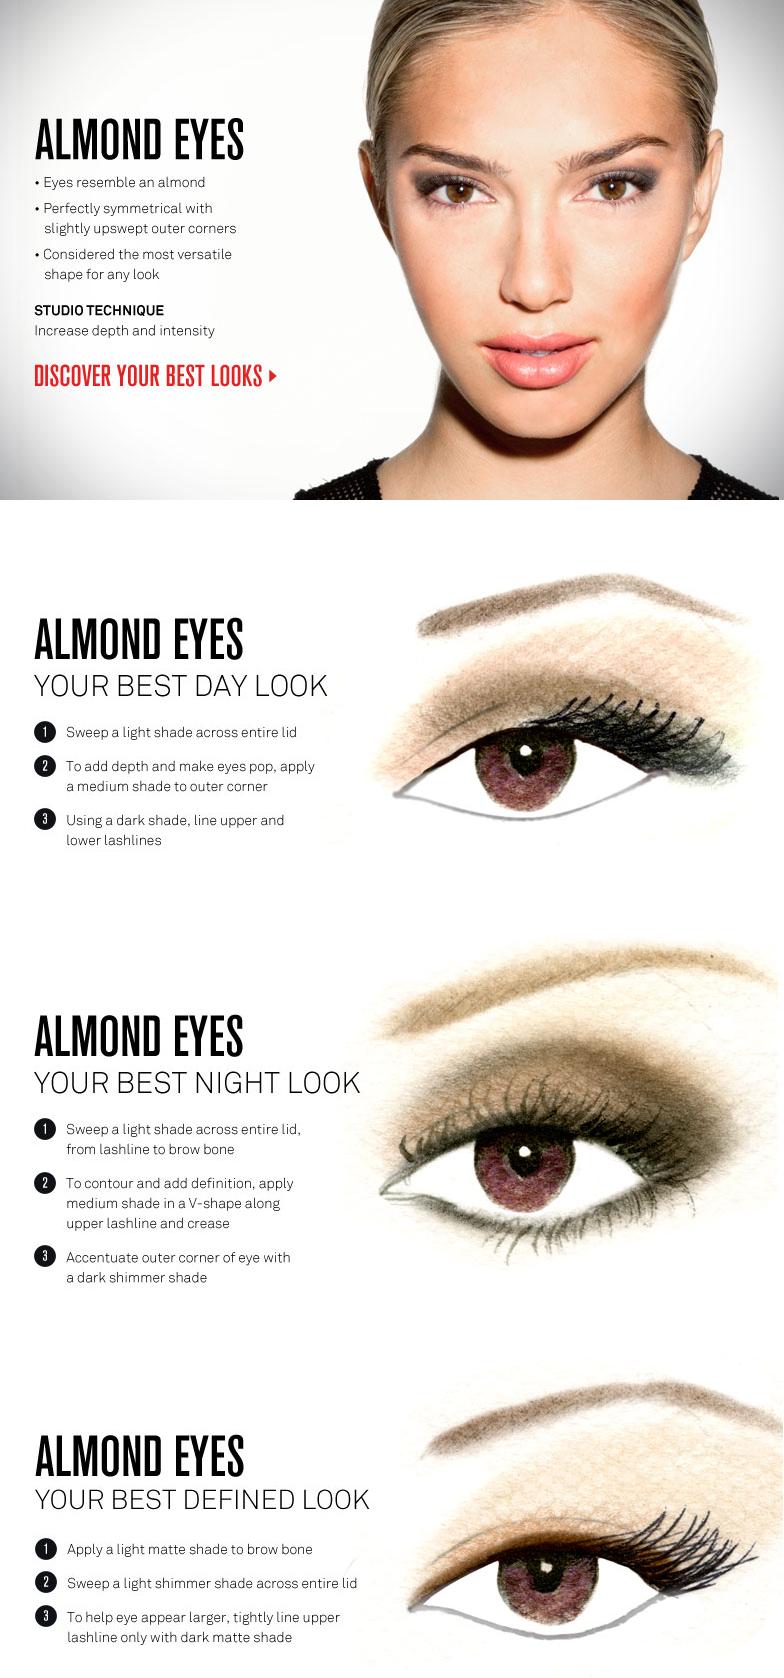 Eye Makeup for Almond Eyes, by Smashbox … | Eye shape makeup ...